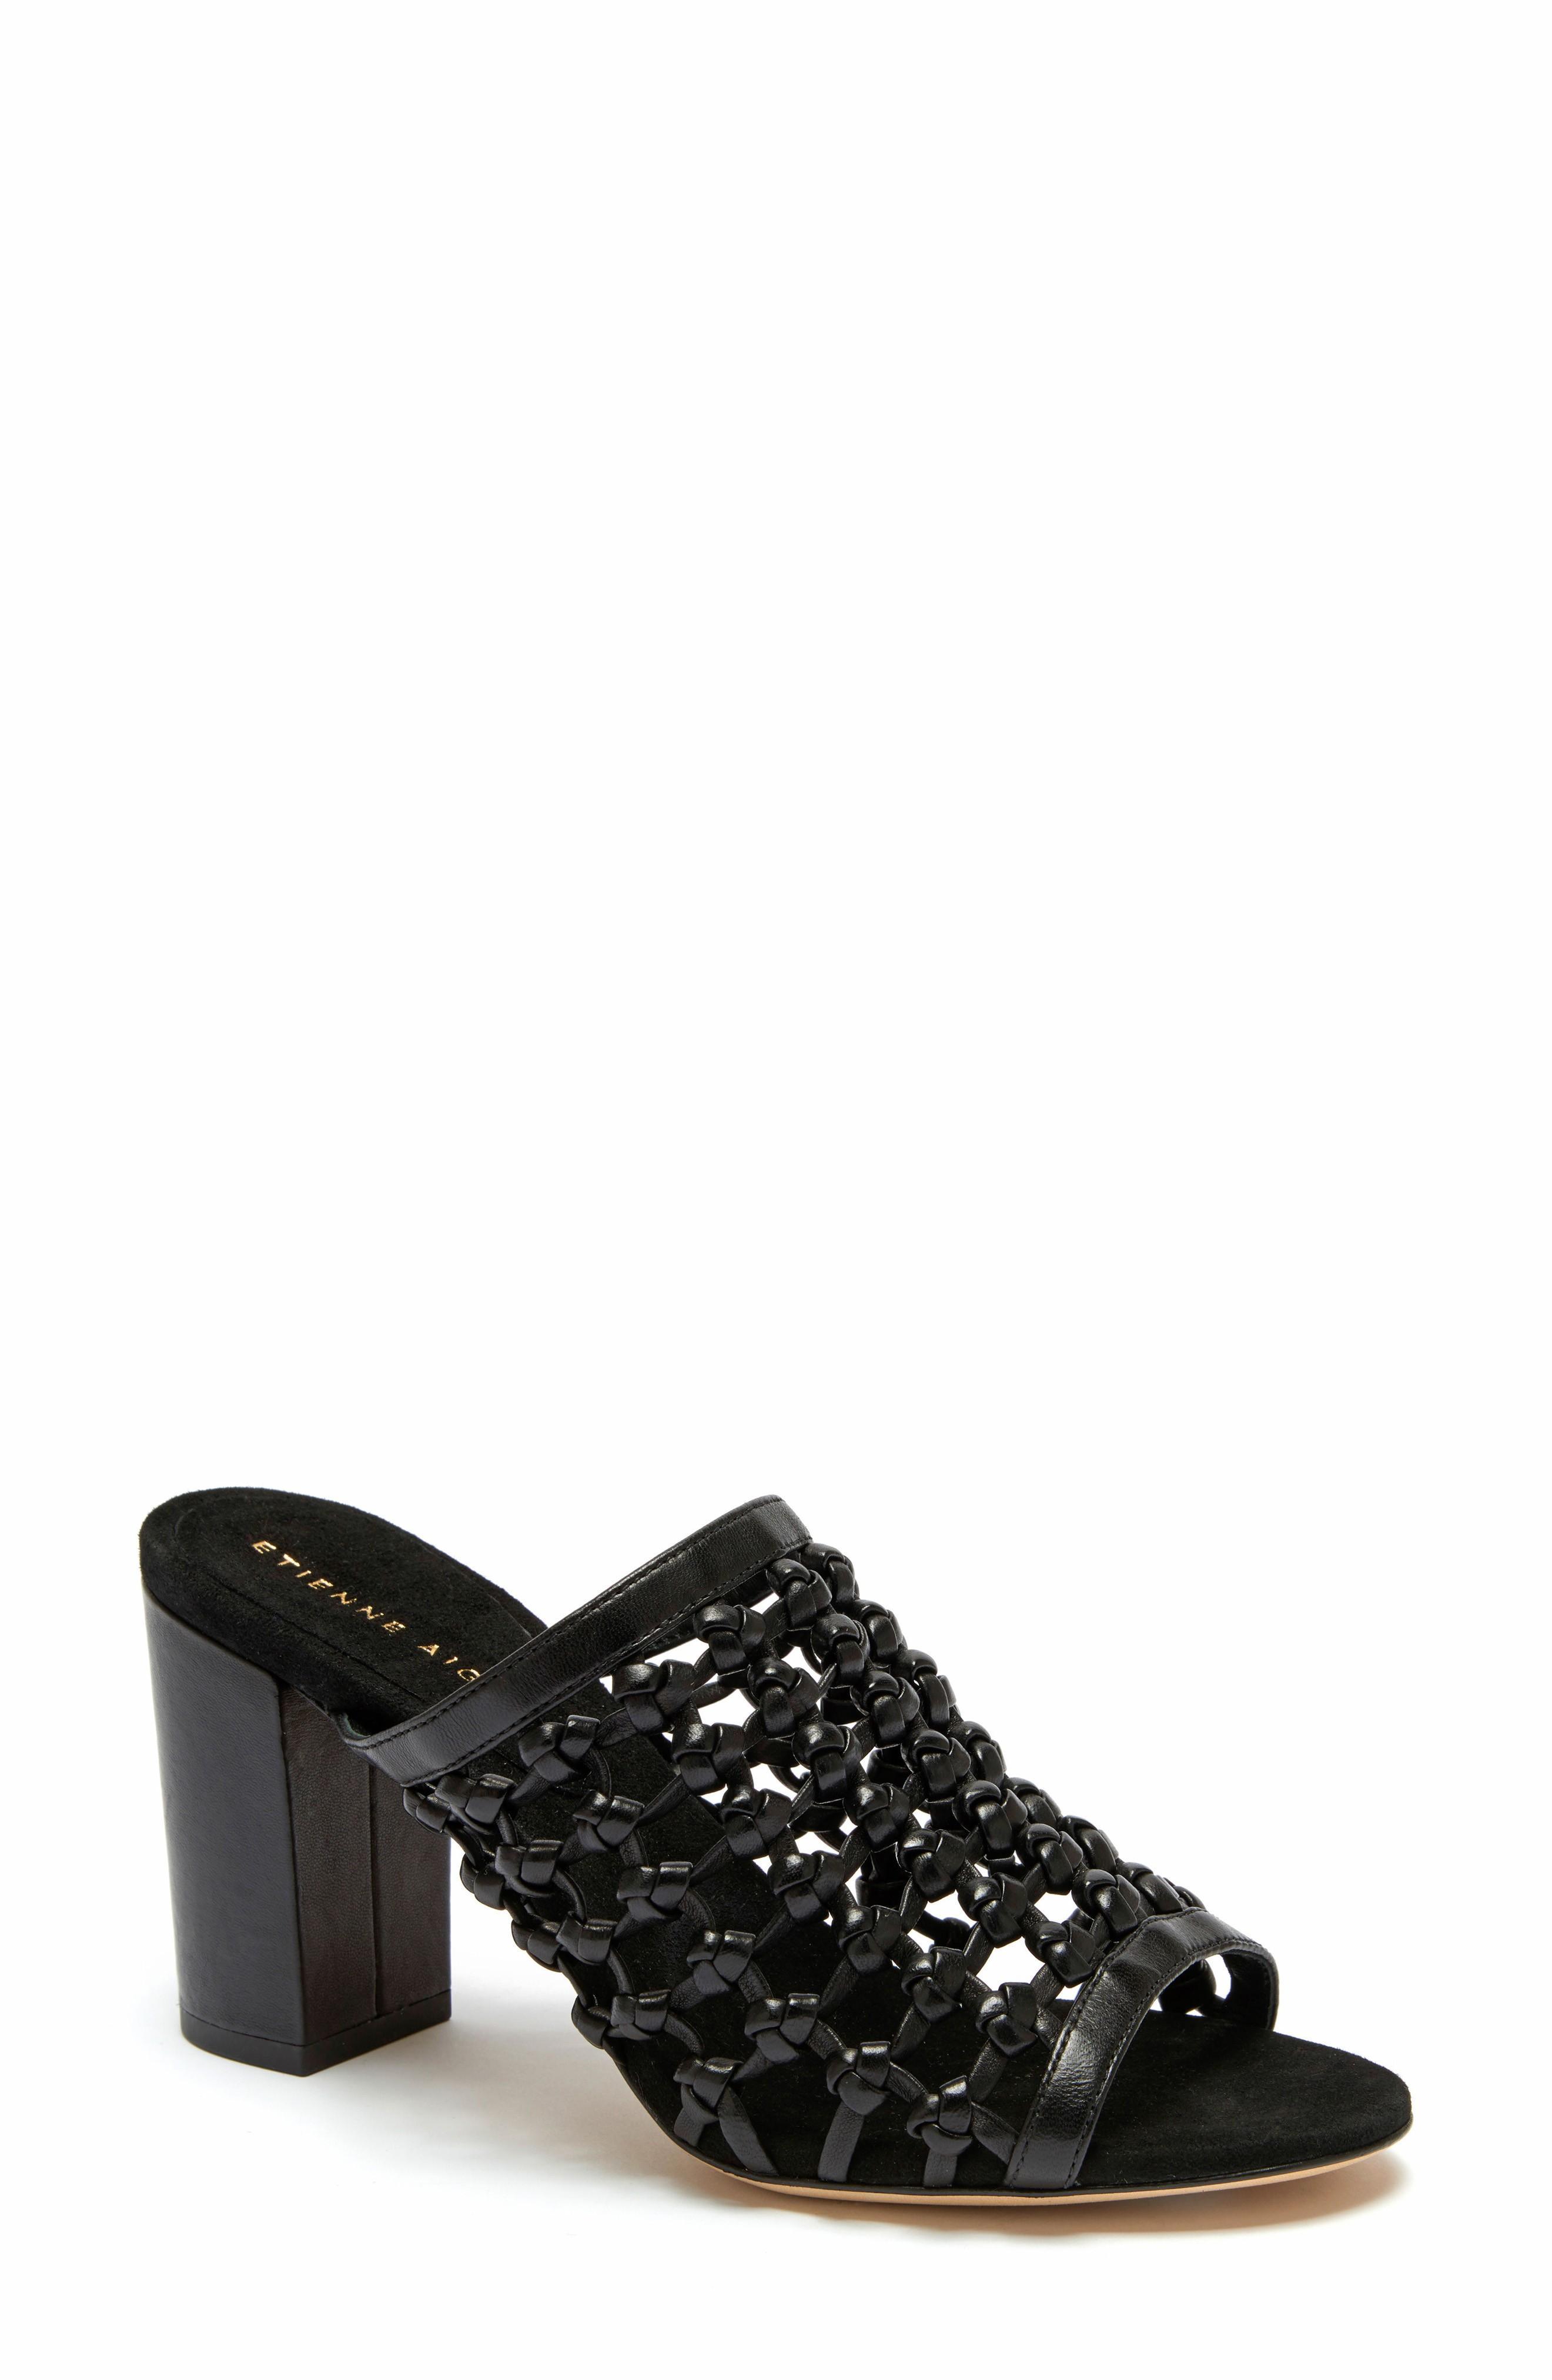 Etienne Aigner Lanai Sandal In Black Leather